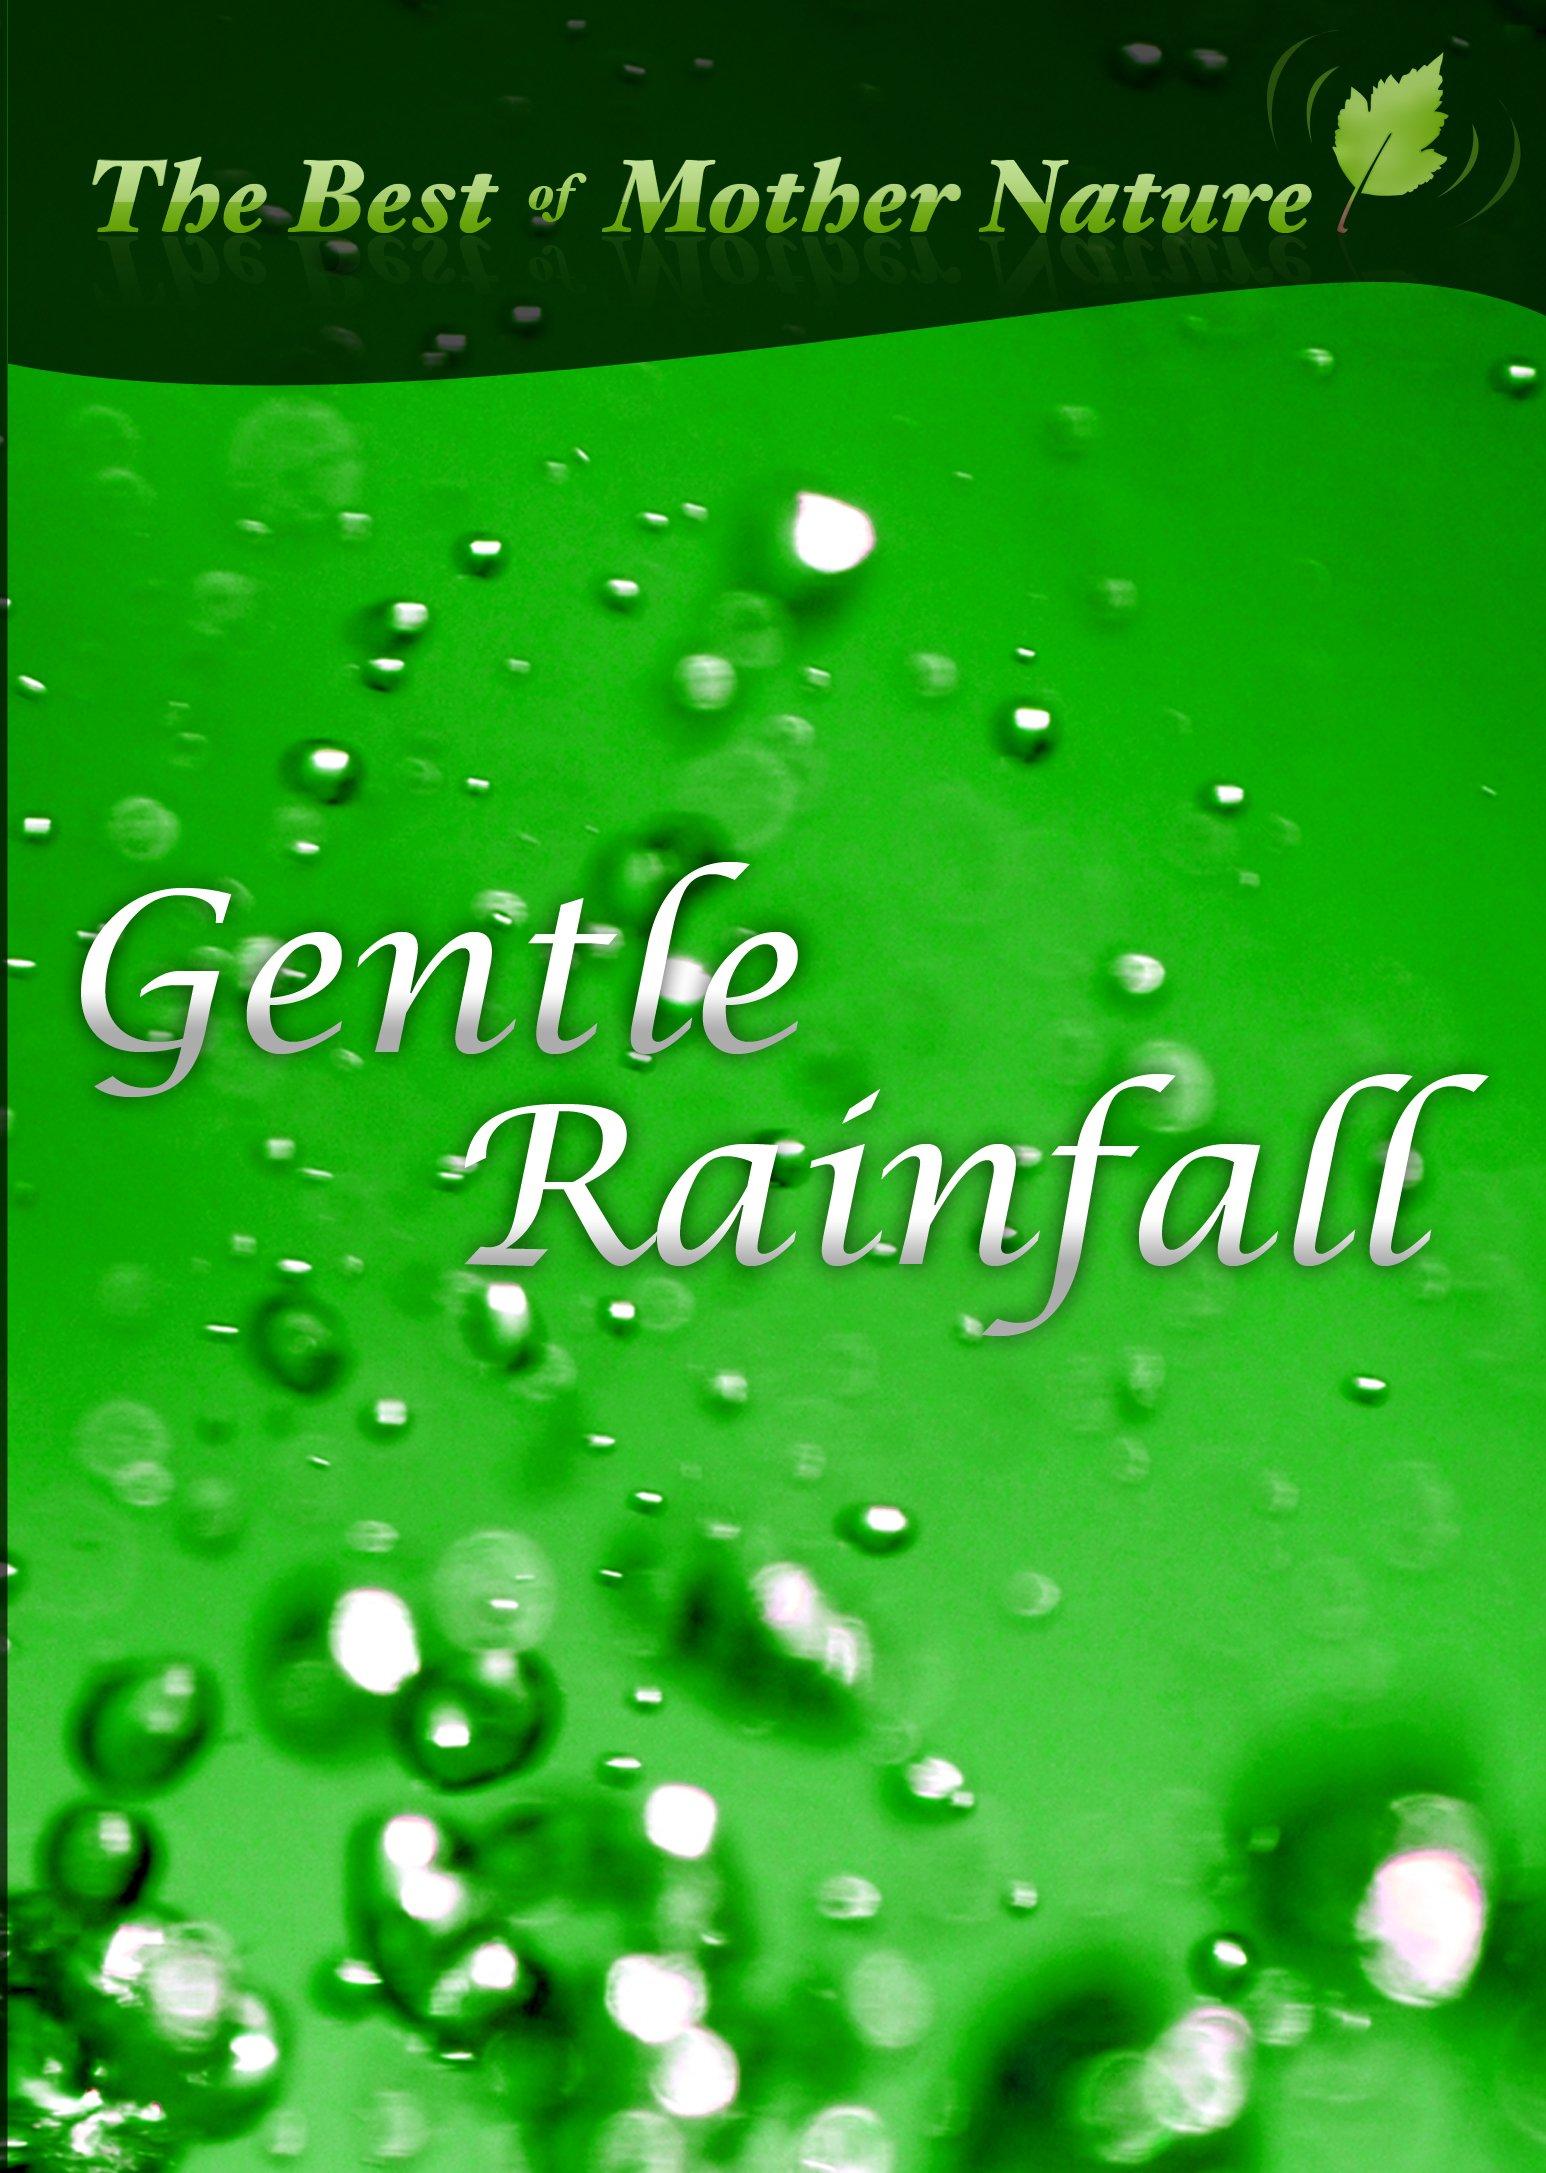 Rain Sounds - Nature Sounds CD